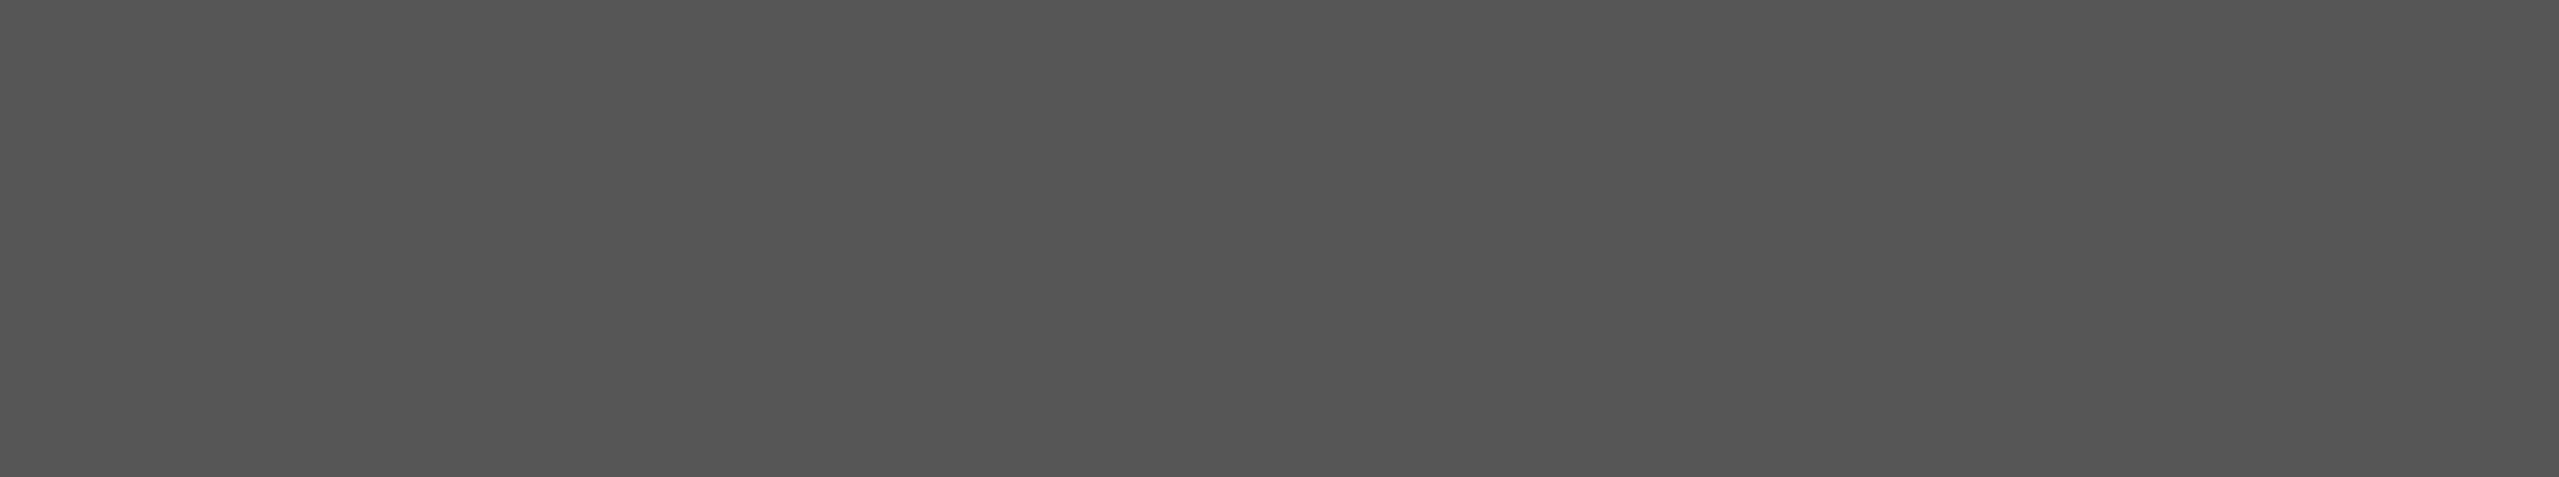 grey_image3